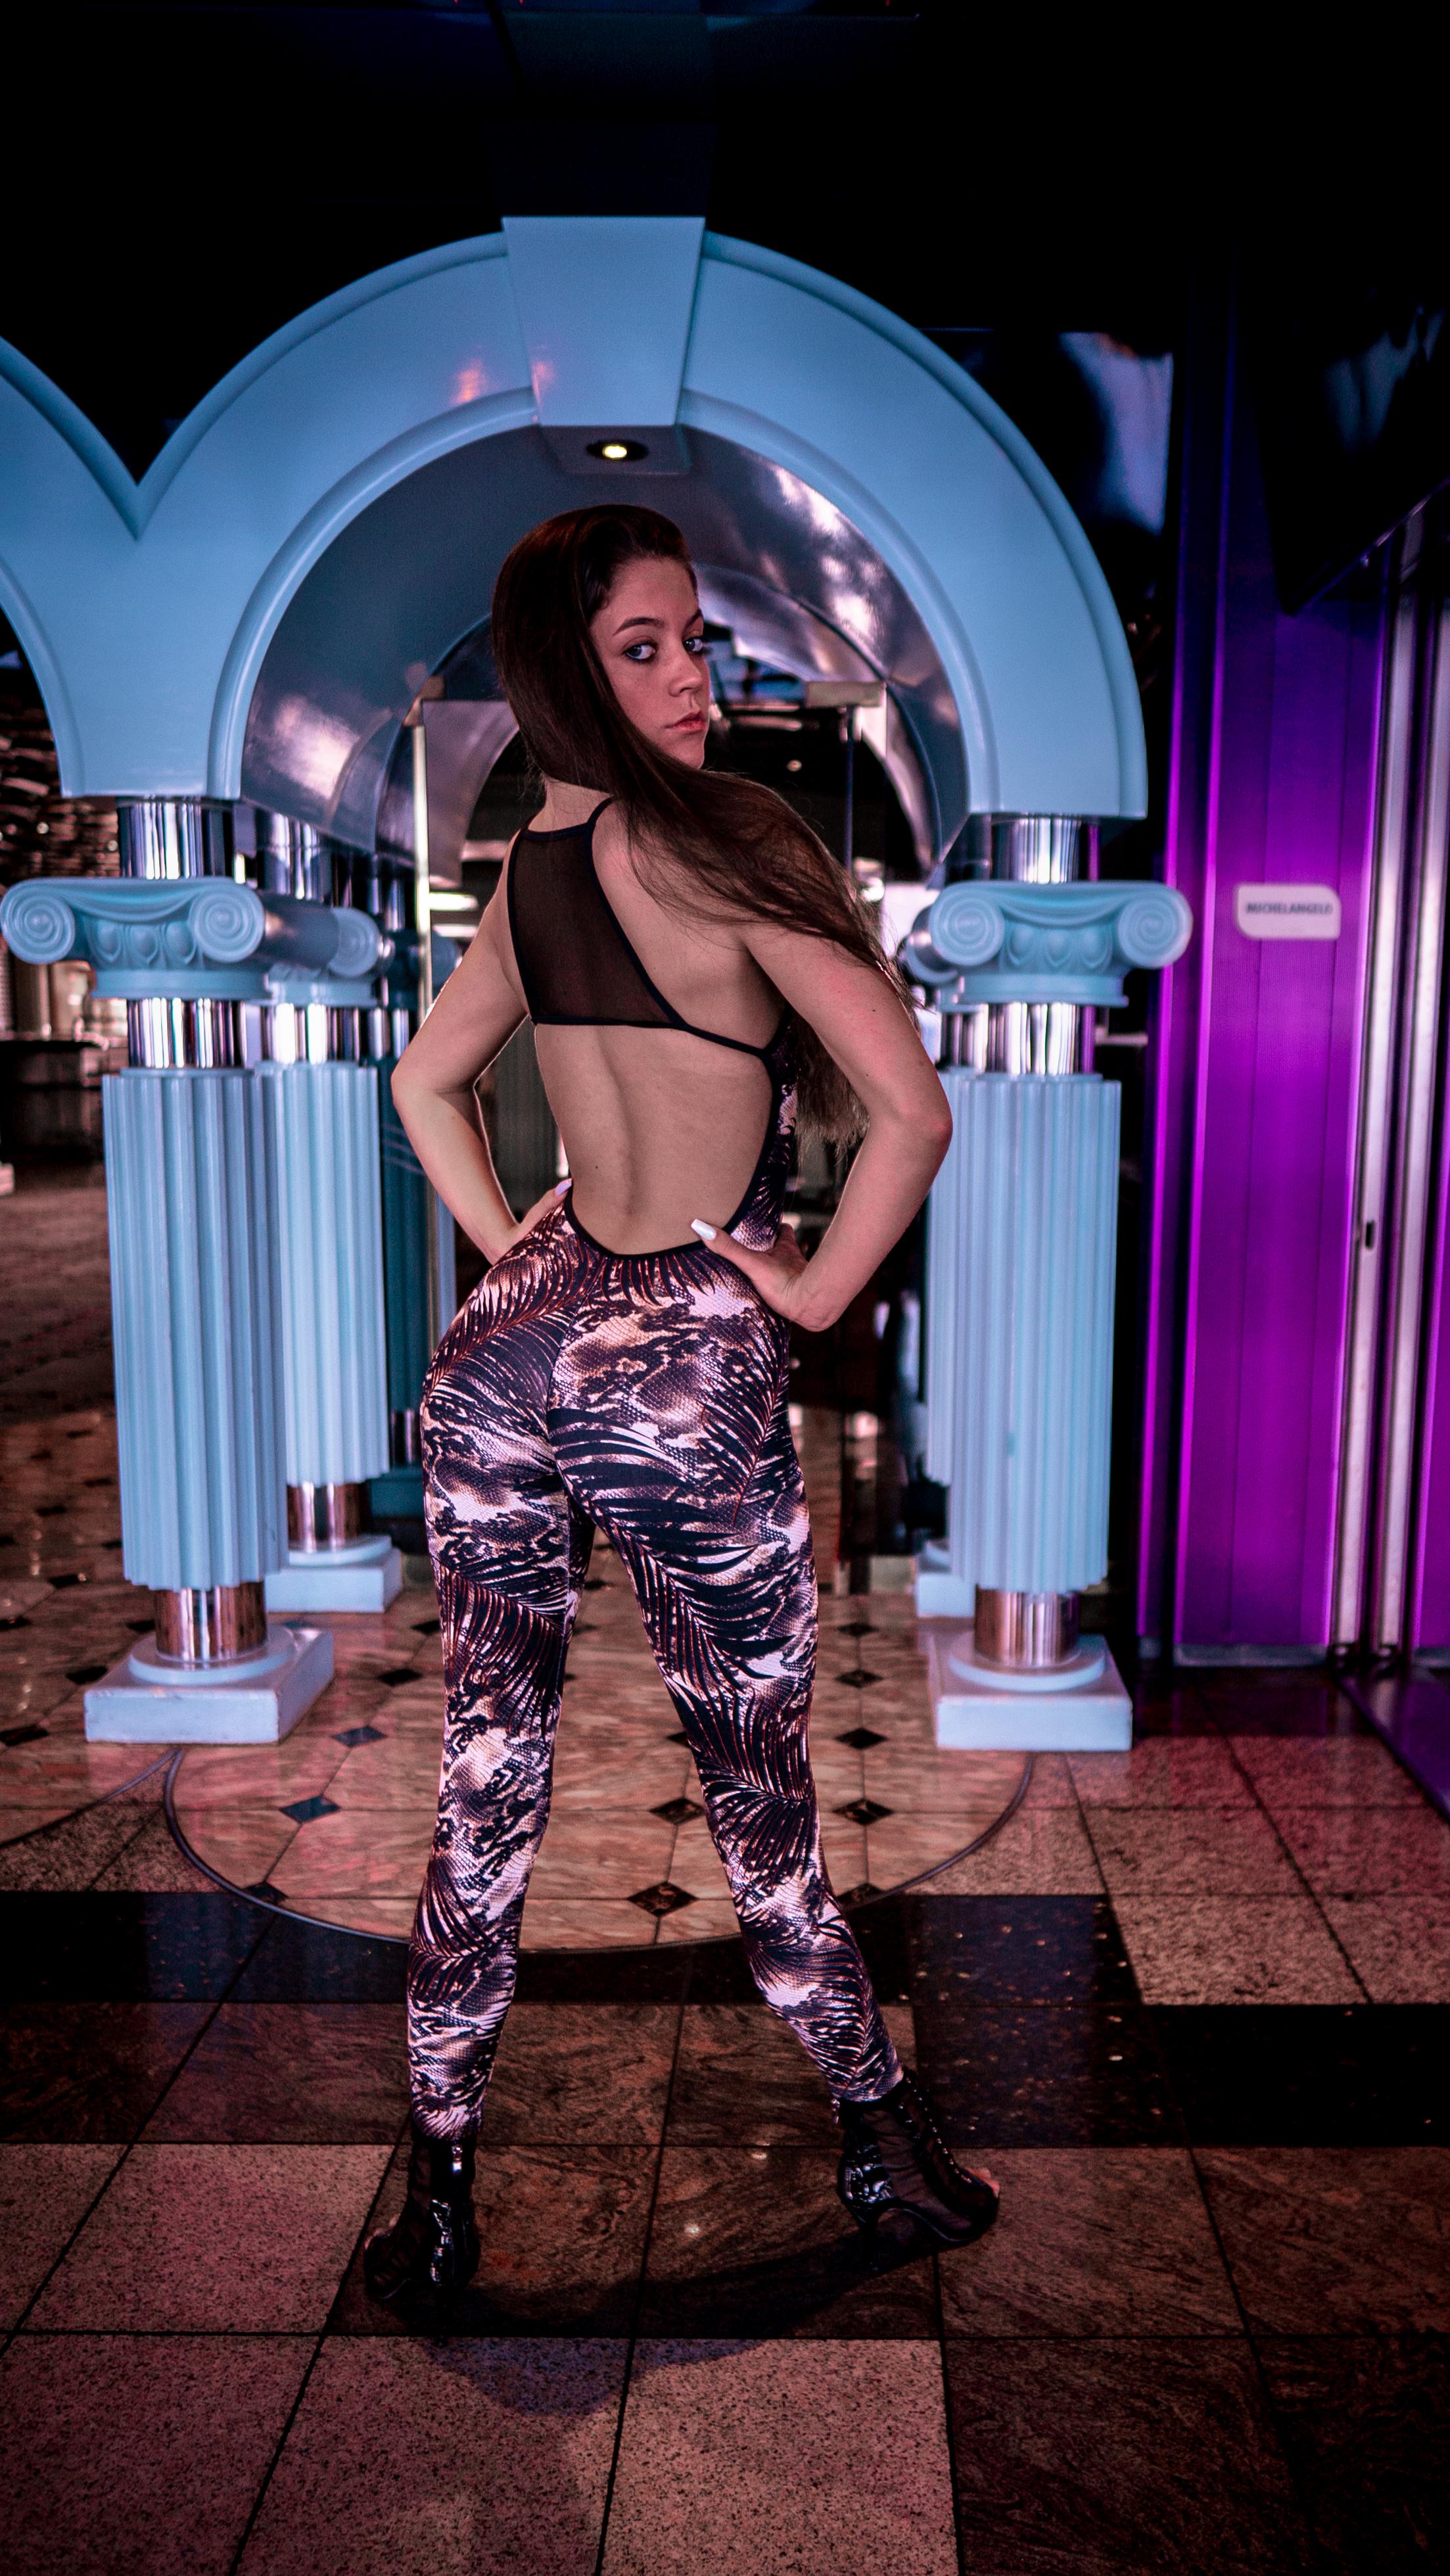 2019 - 11 - 17 - Aventura Dance Cruise -